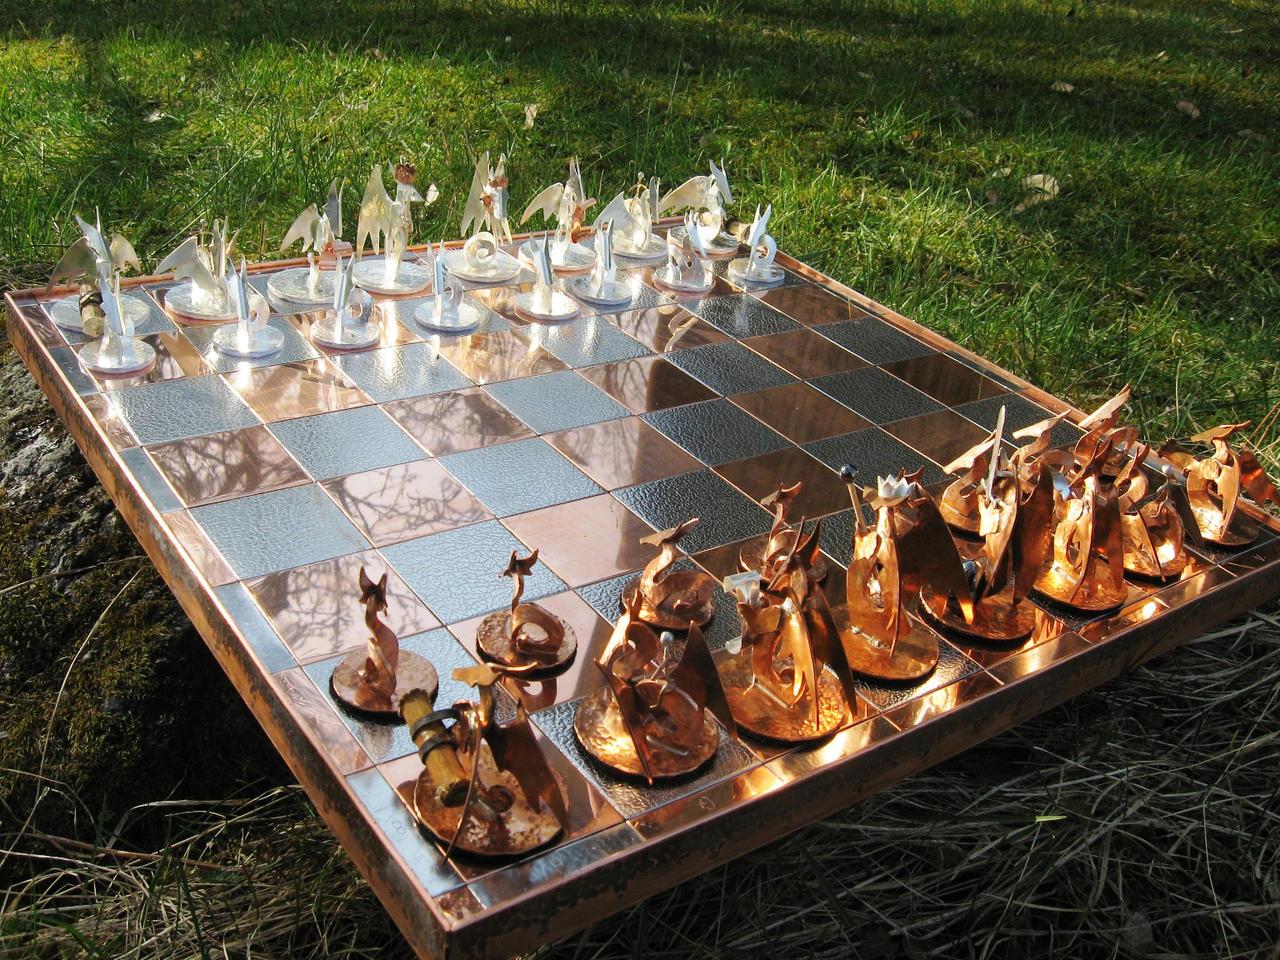 Chess Set of Dragons